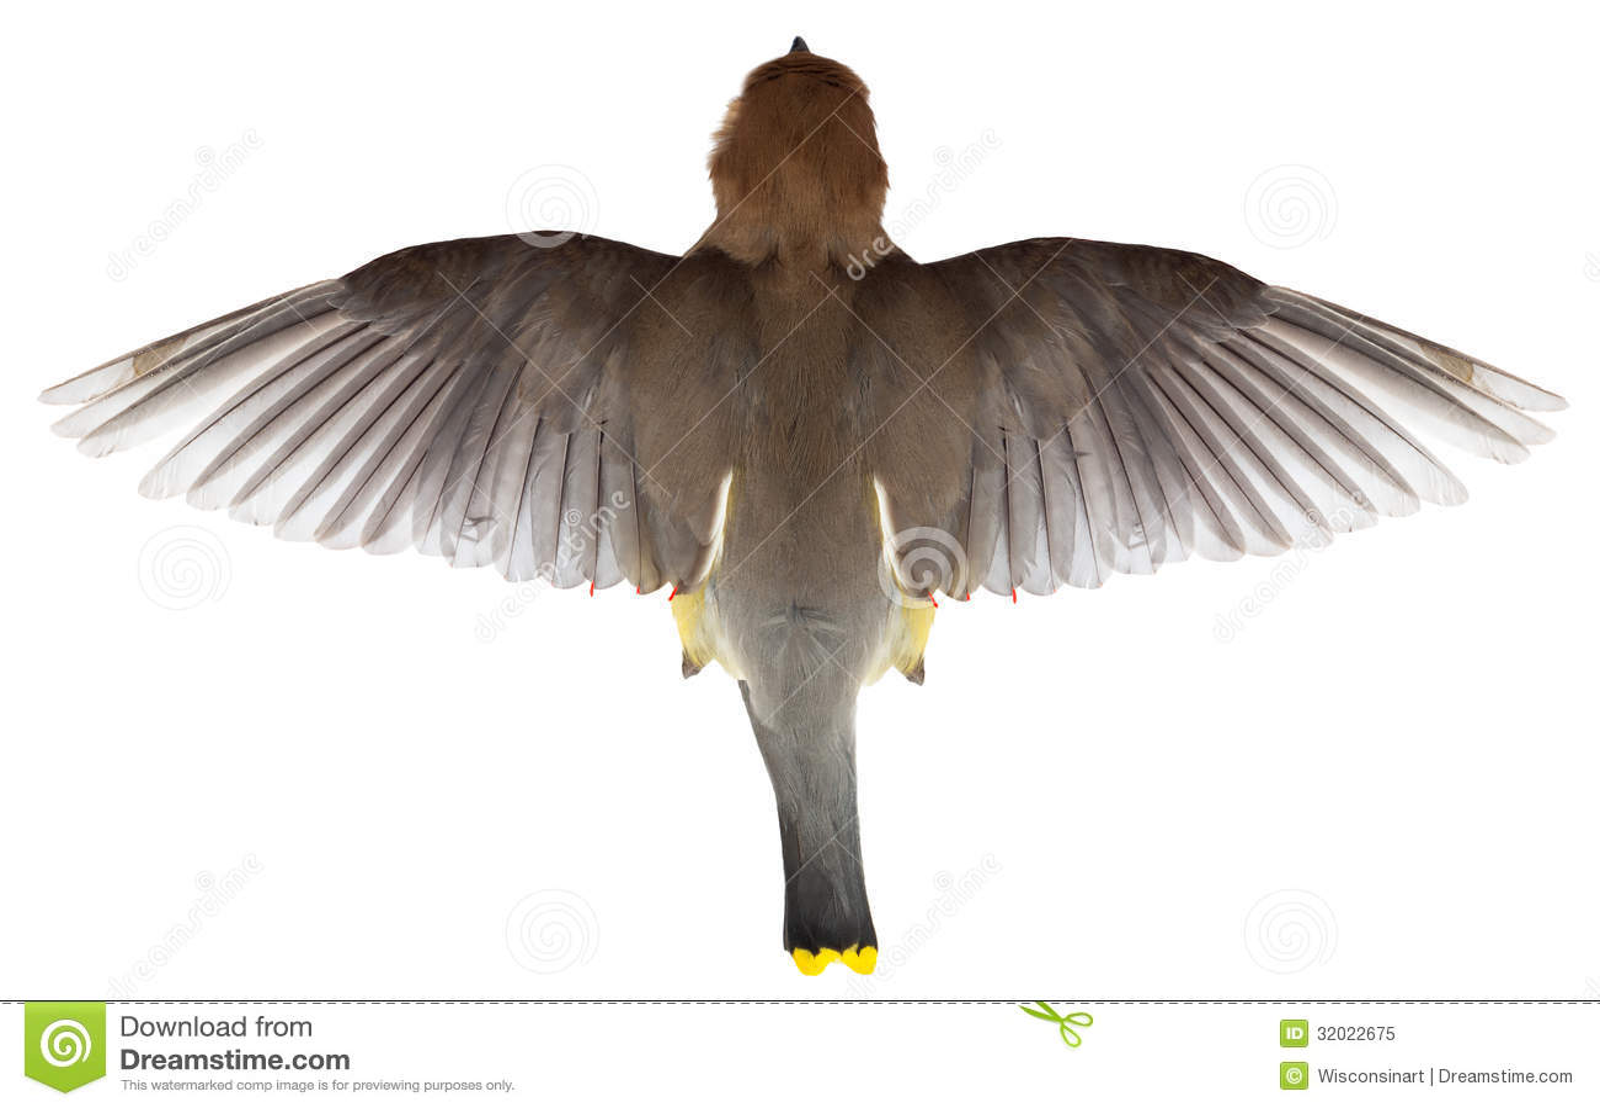 Vliegende Vogel, Hoogste Mening van Vlucht, Vleugels,